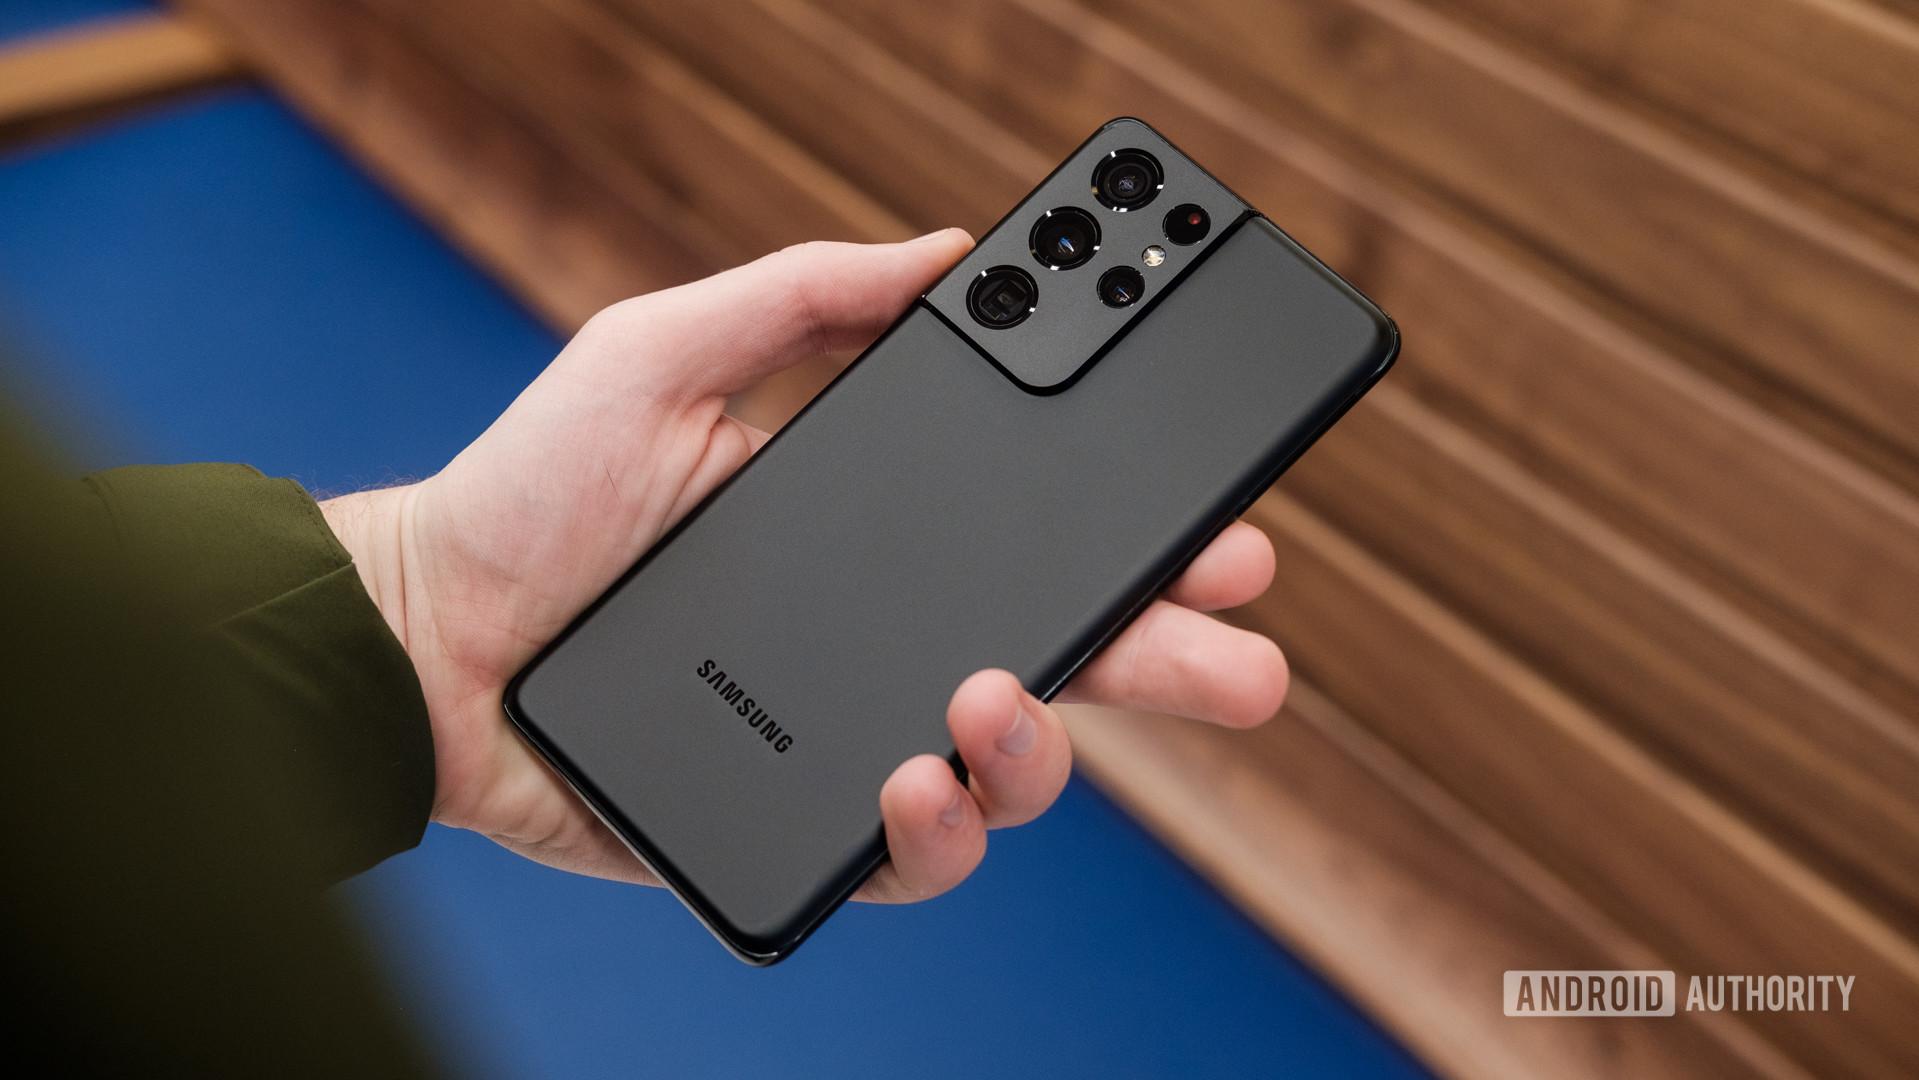 Samsung Galaxy S21 Ultra back in hand 1